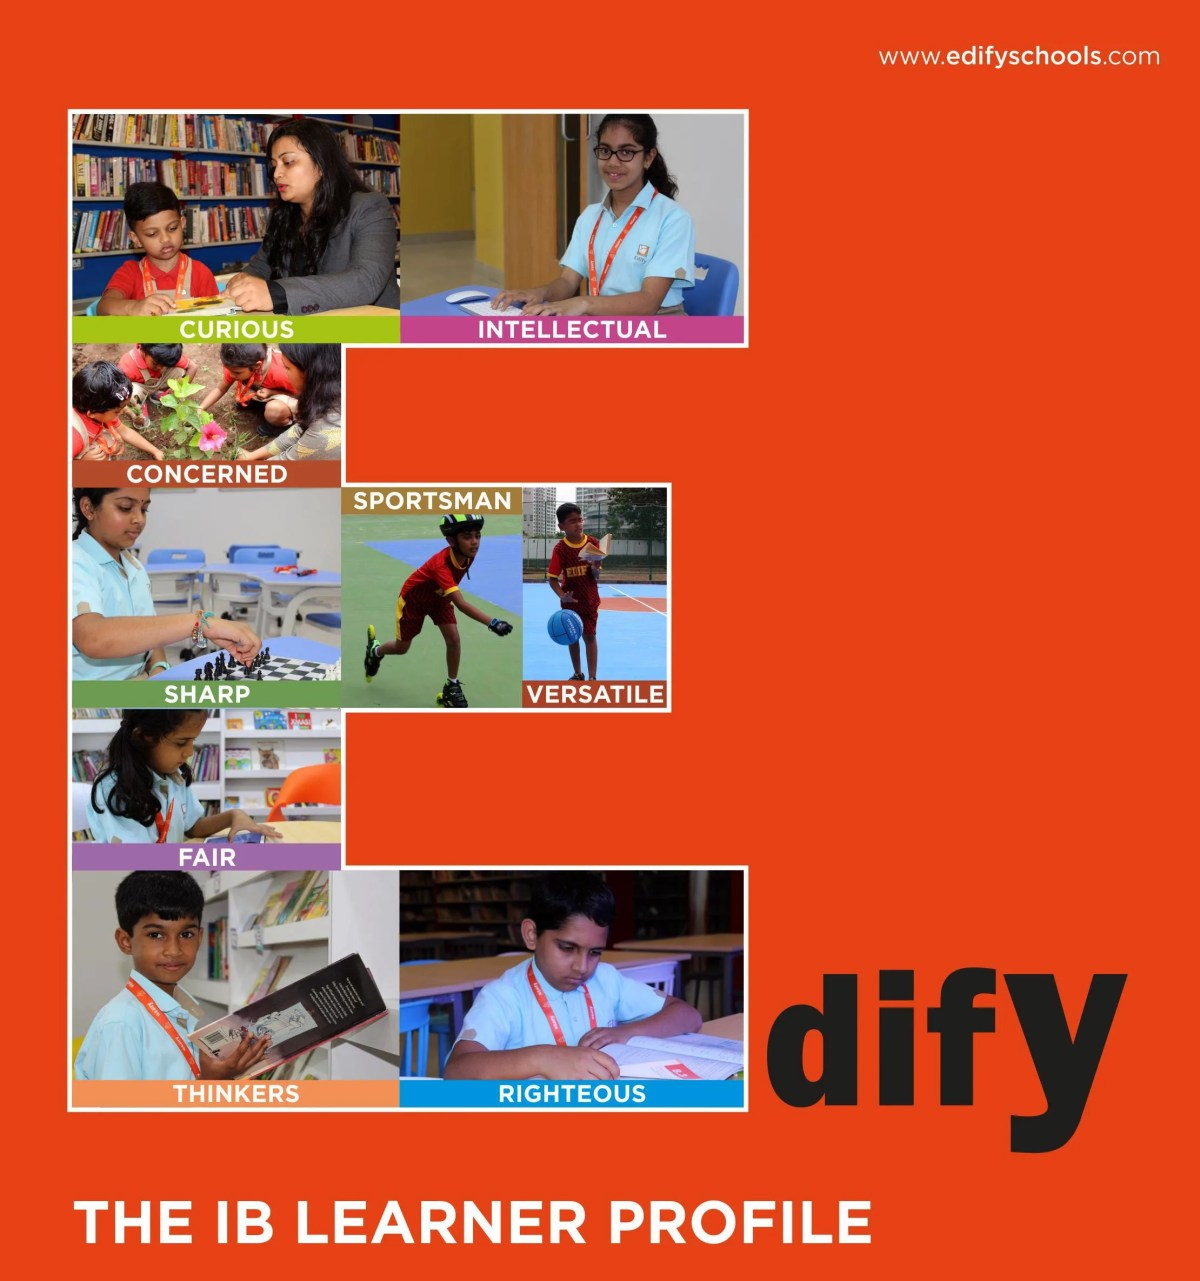 Edify International IB School Design Sample 2